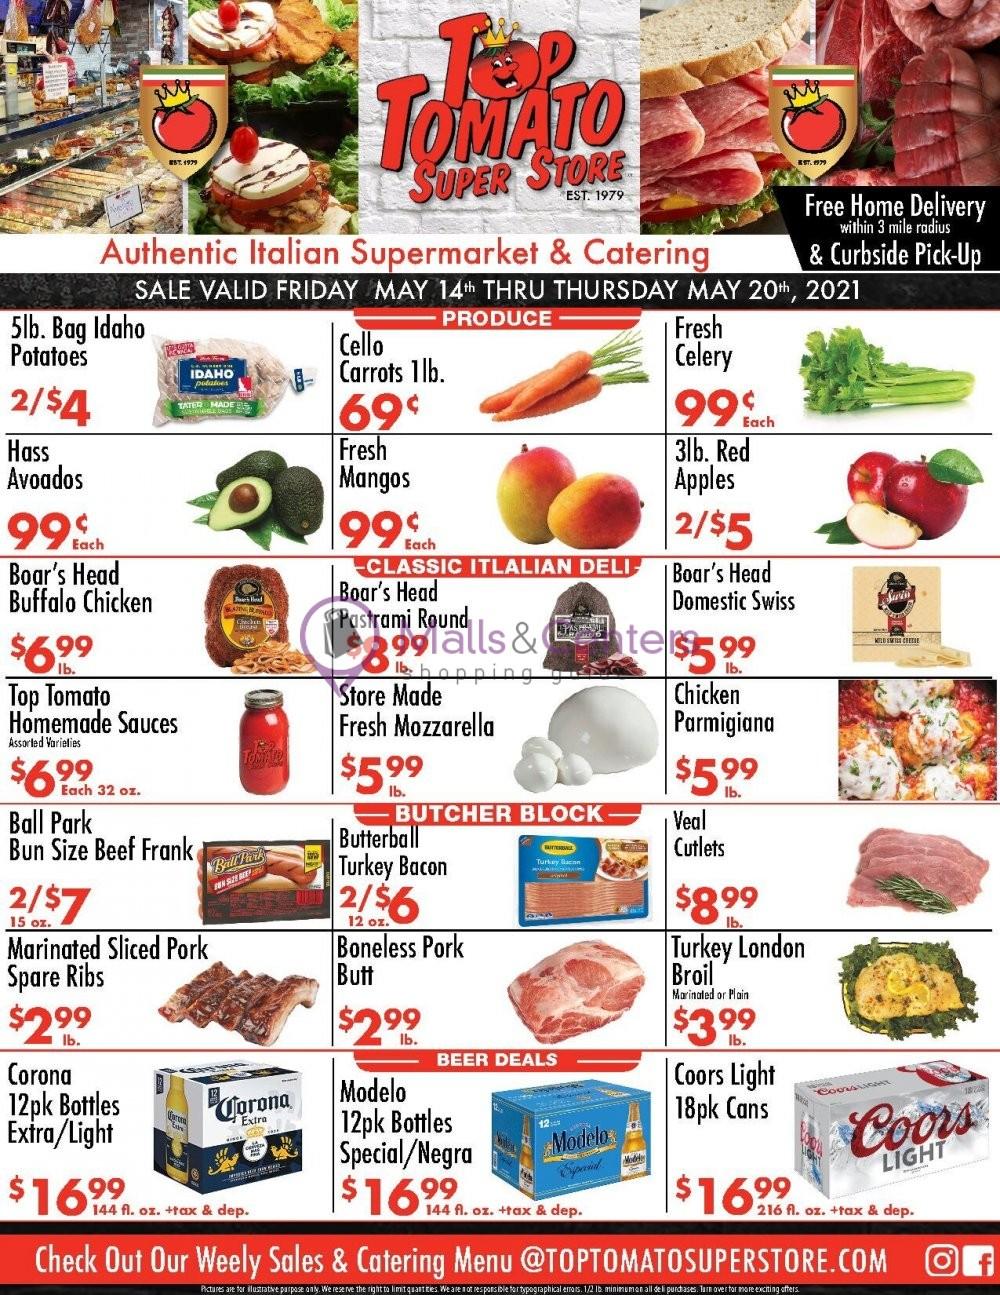 weekly ads Top Tomato Super Store - page 1 - mallscenters.com